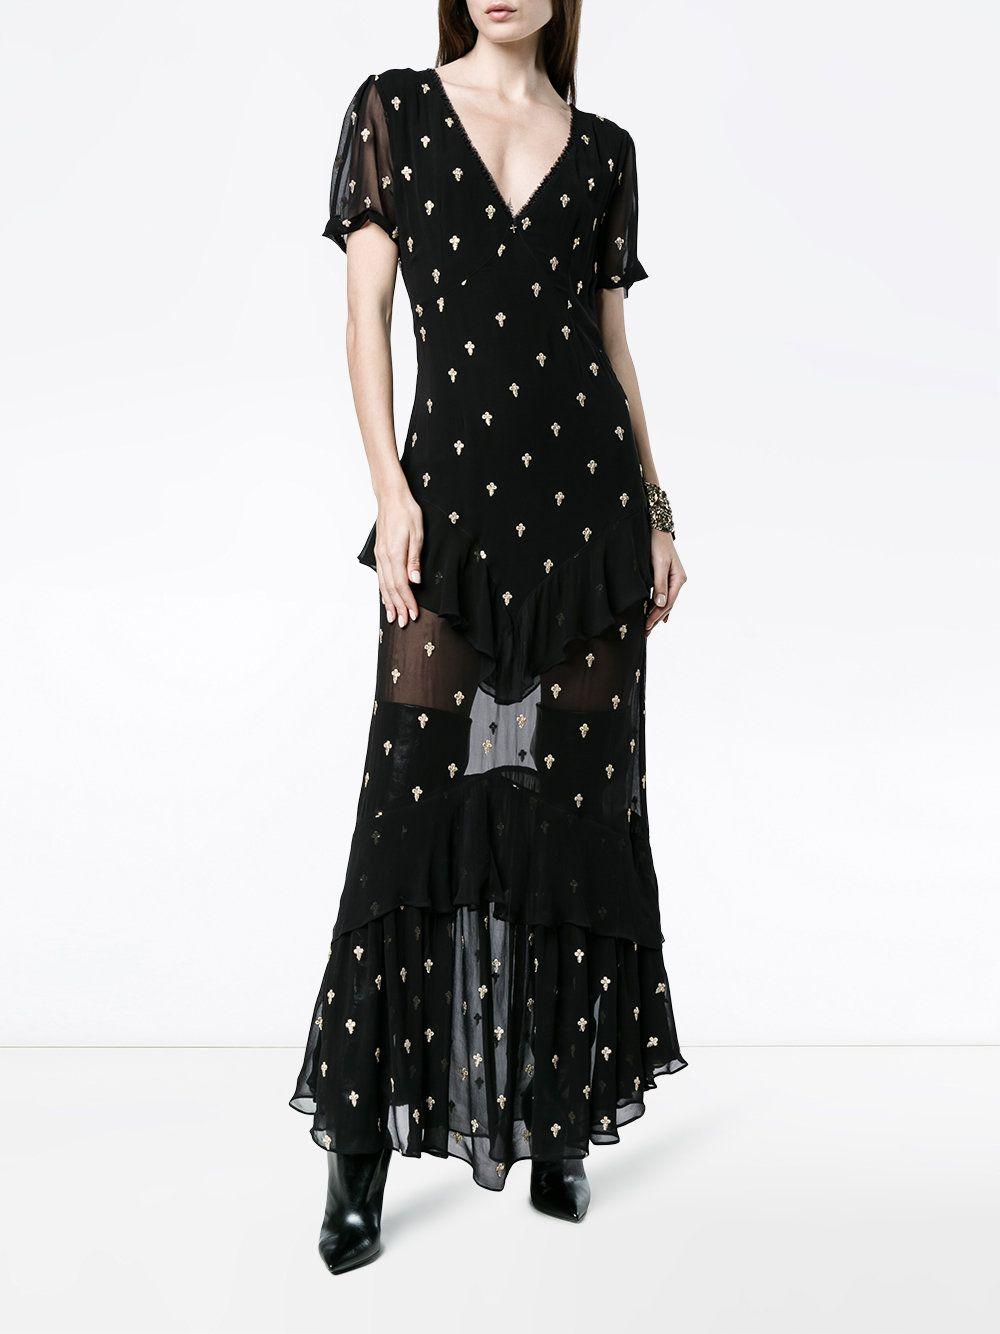 Juliette cross embroidered dress De La Vali 13A43KqVmo